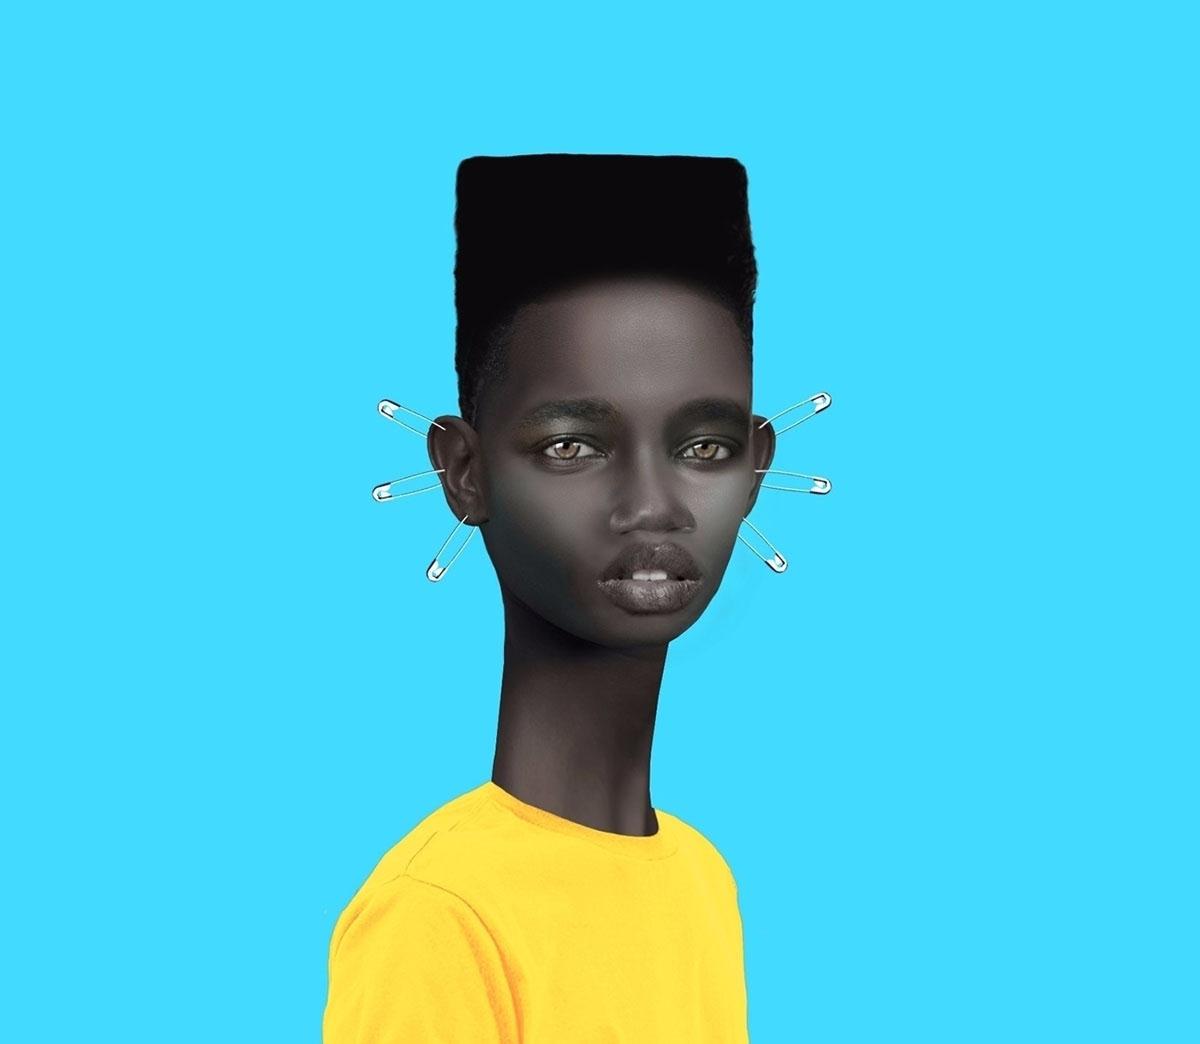 black boy against blue background